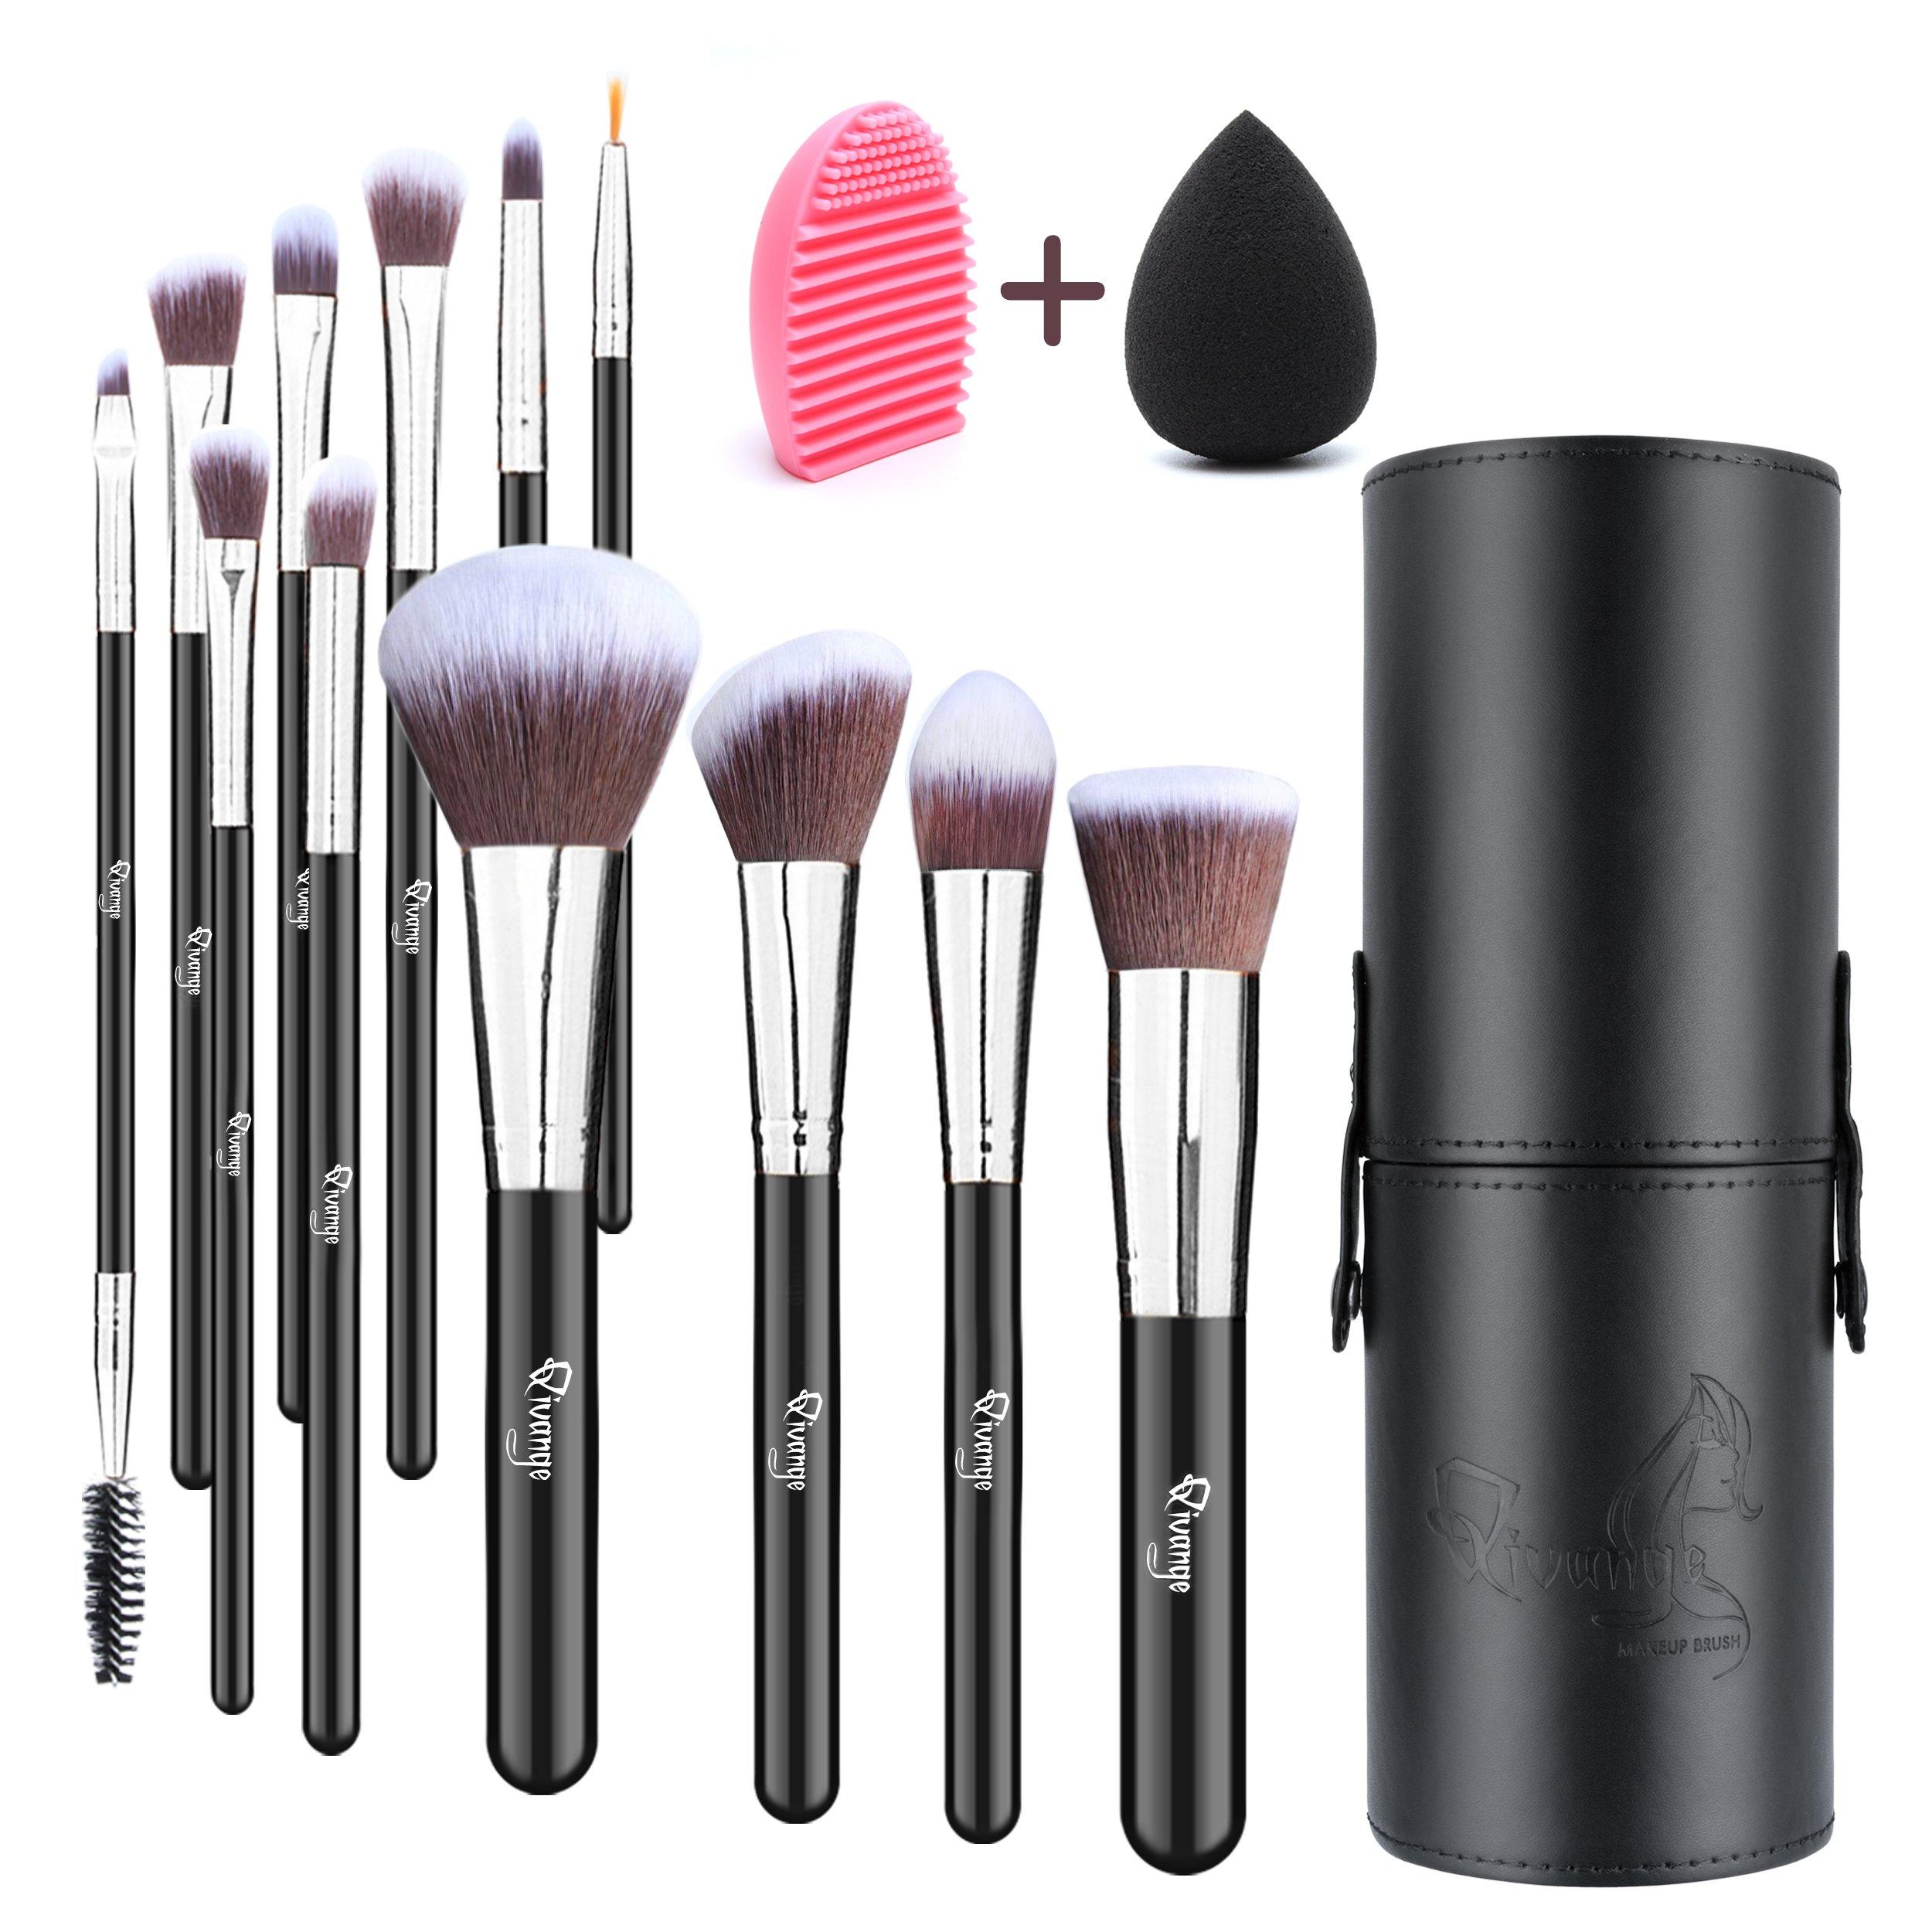 Qivange Makeup Brush Set, Synthetic Makeup Brushes with Case, Makeup Sponge & Makeup Brush